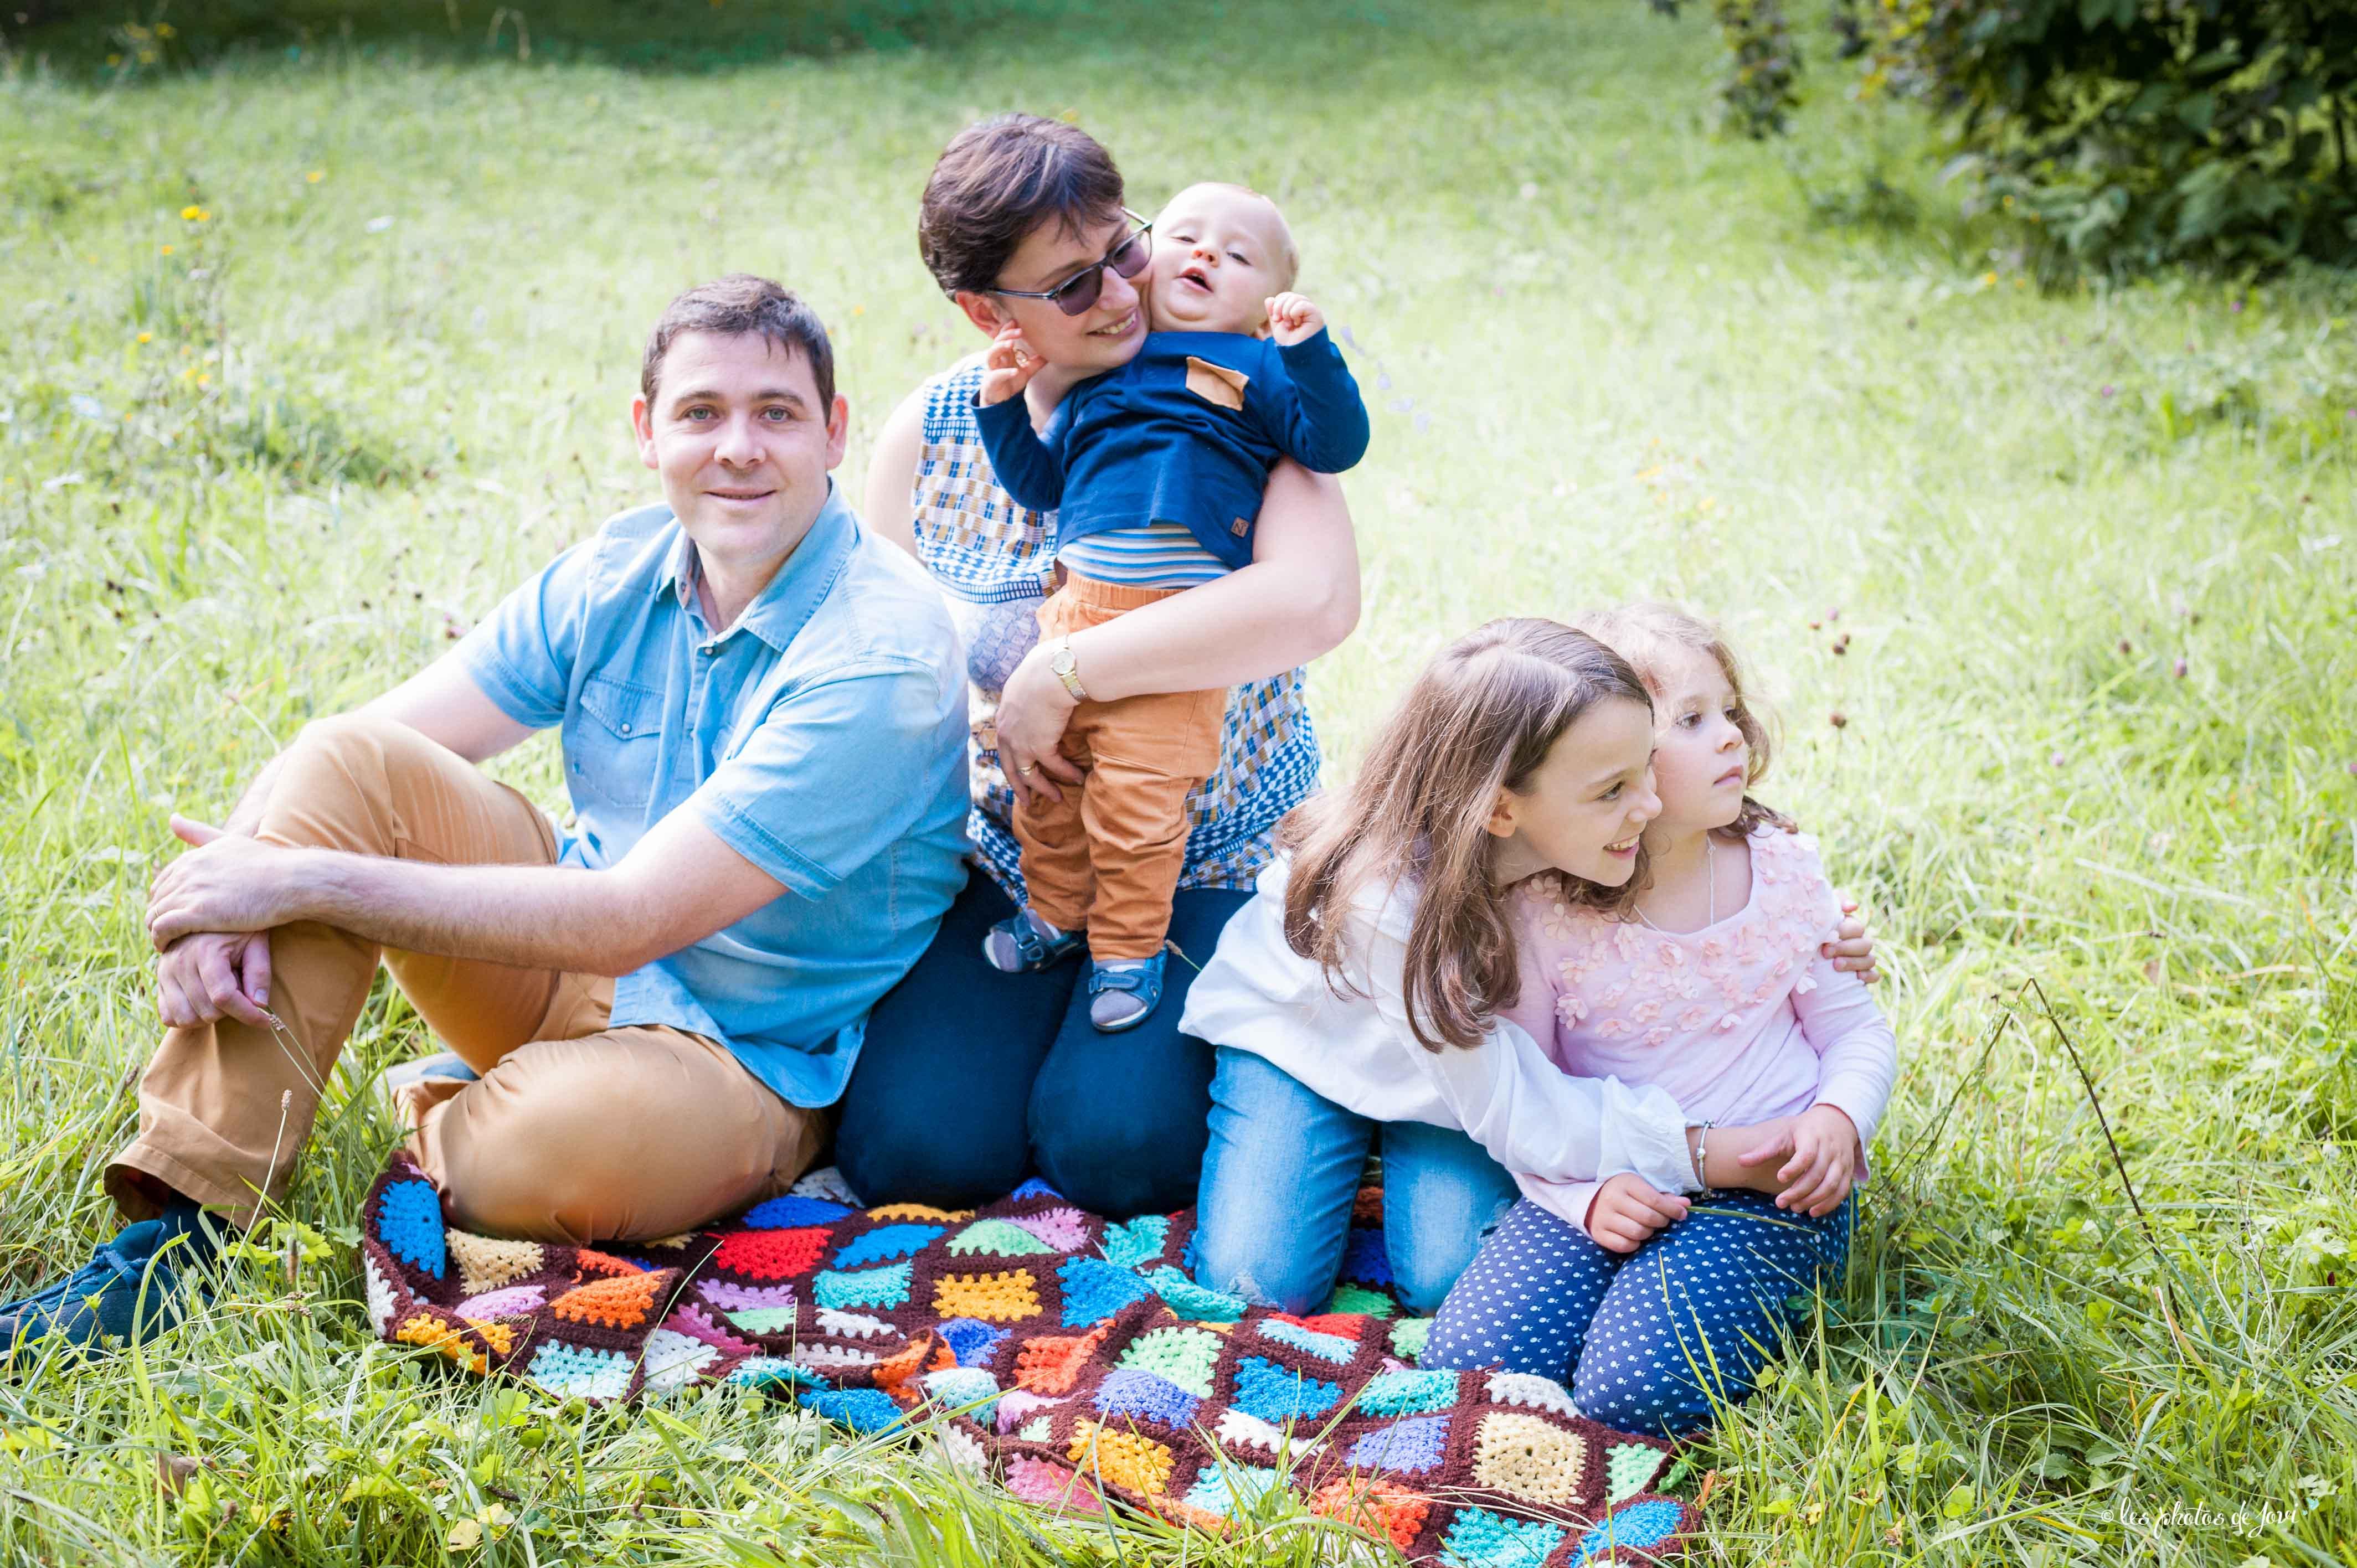 Séance photo en famille Ile Verte